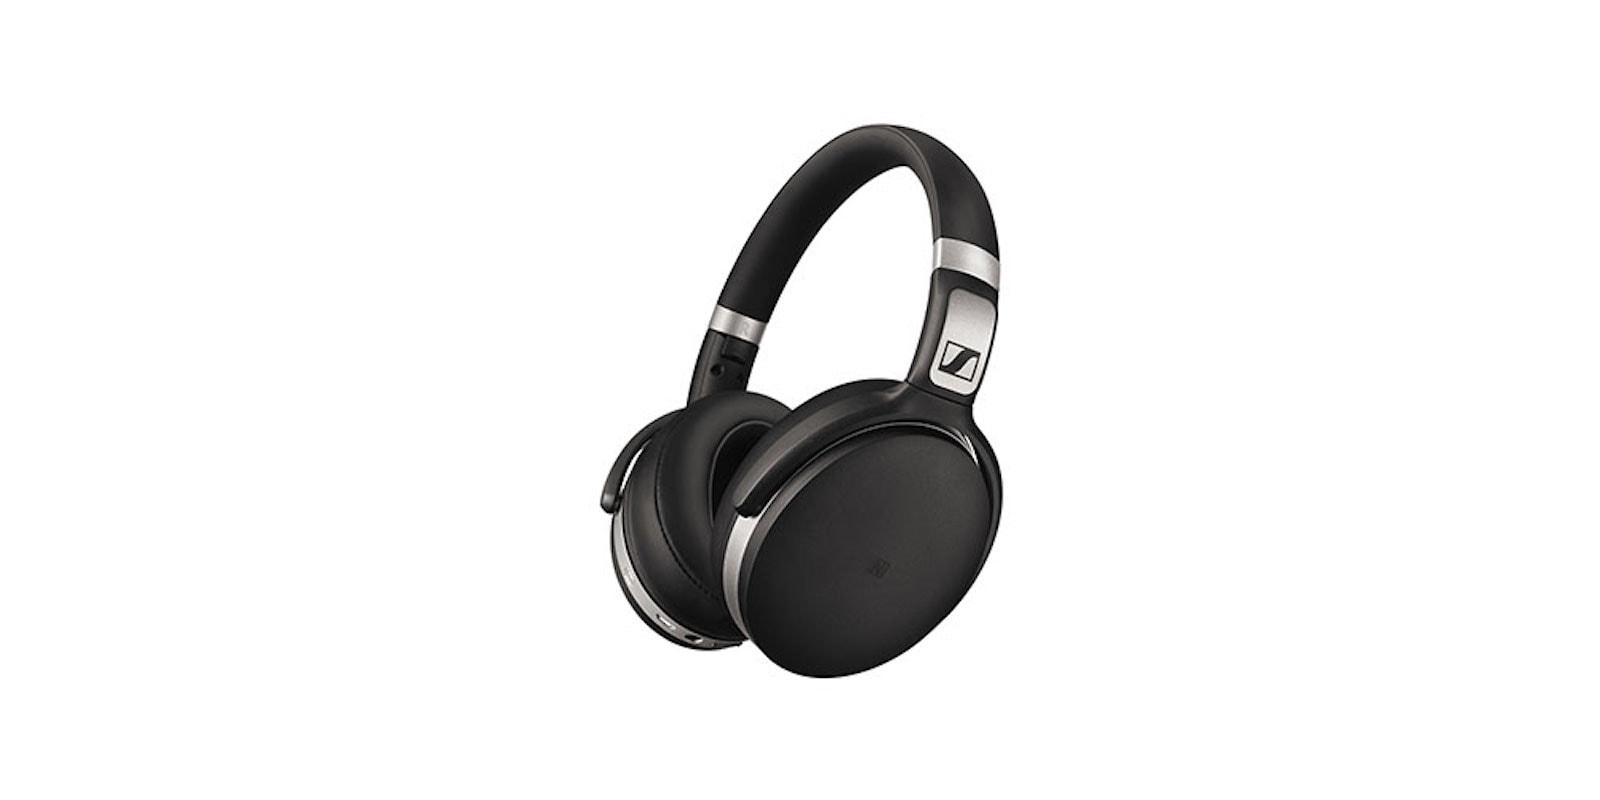 Sennheiser HD 4.50 BTNC Noise Cancelling Over-Ear Headphones